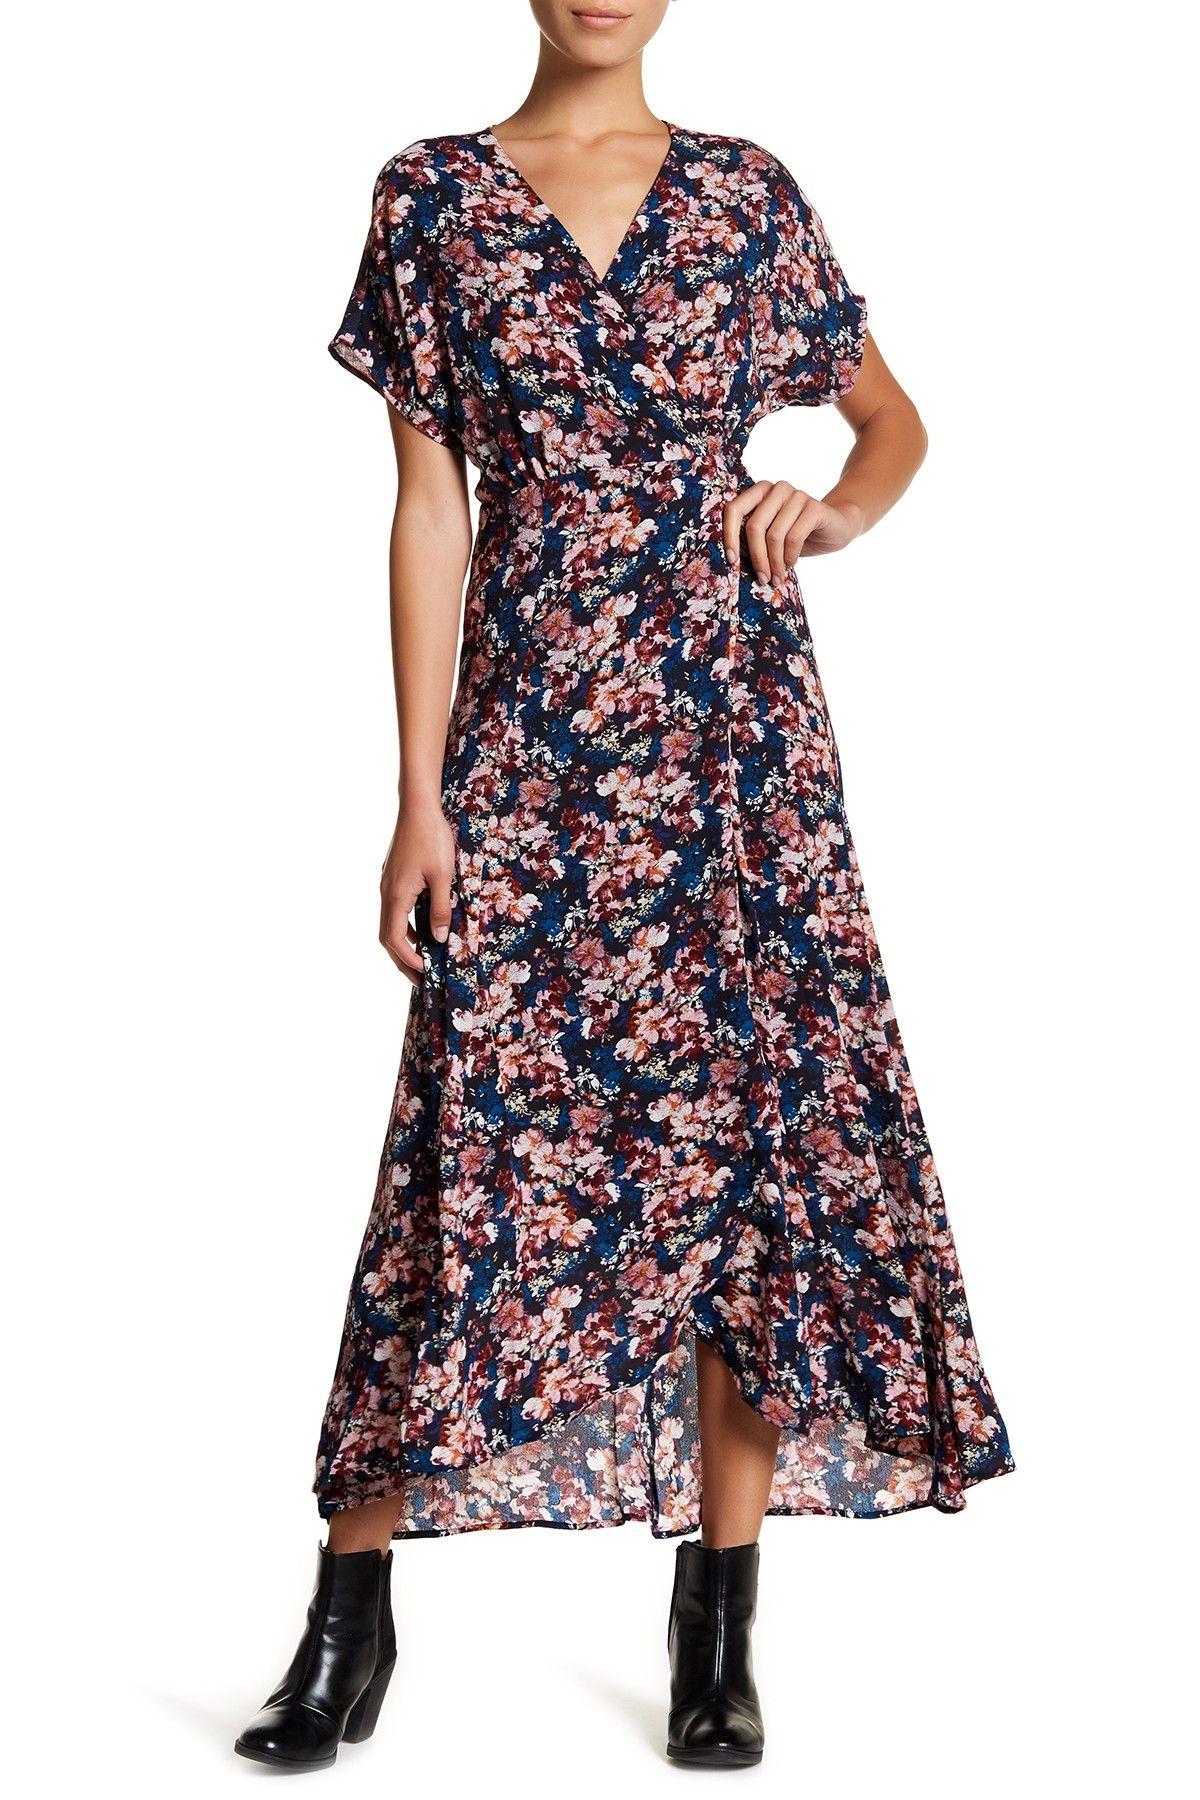 Bobeau short sleeve print wrap maxi dress petite fashion women